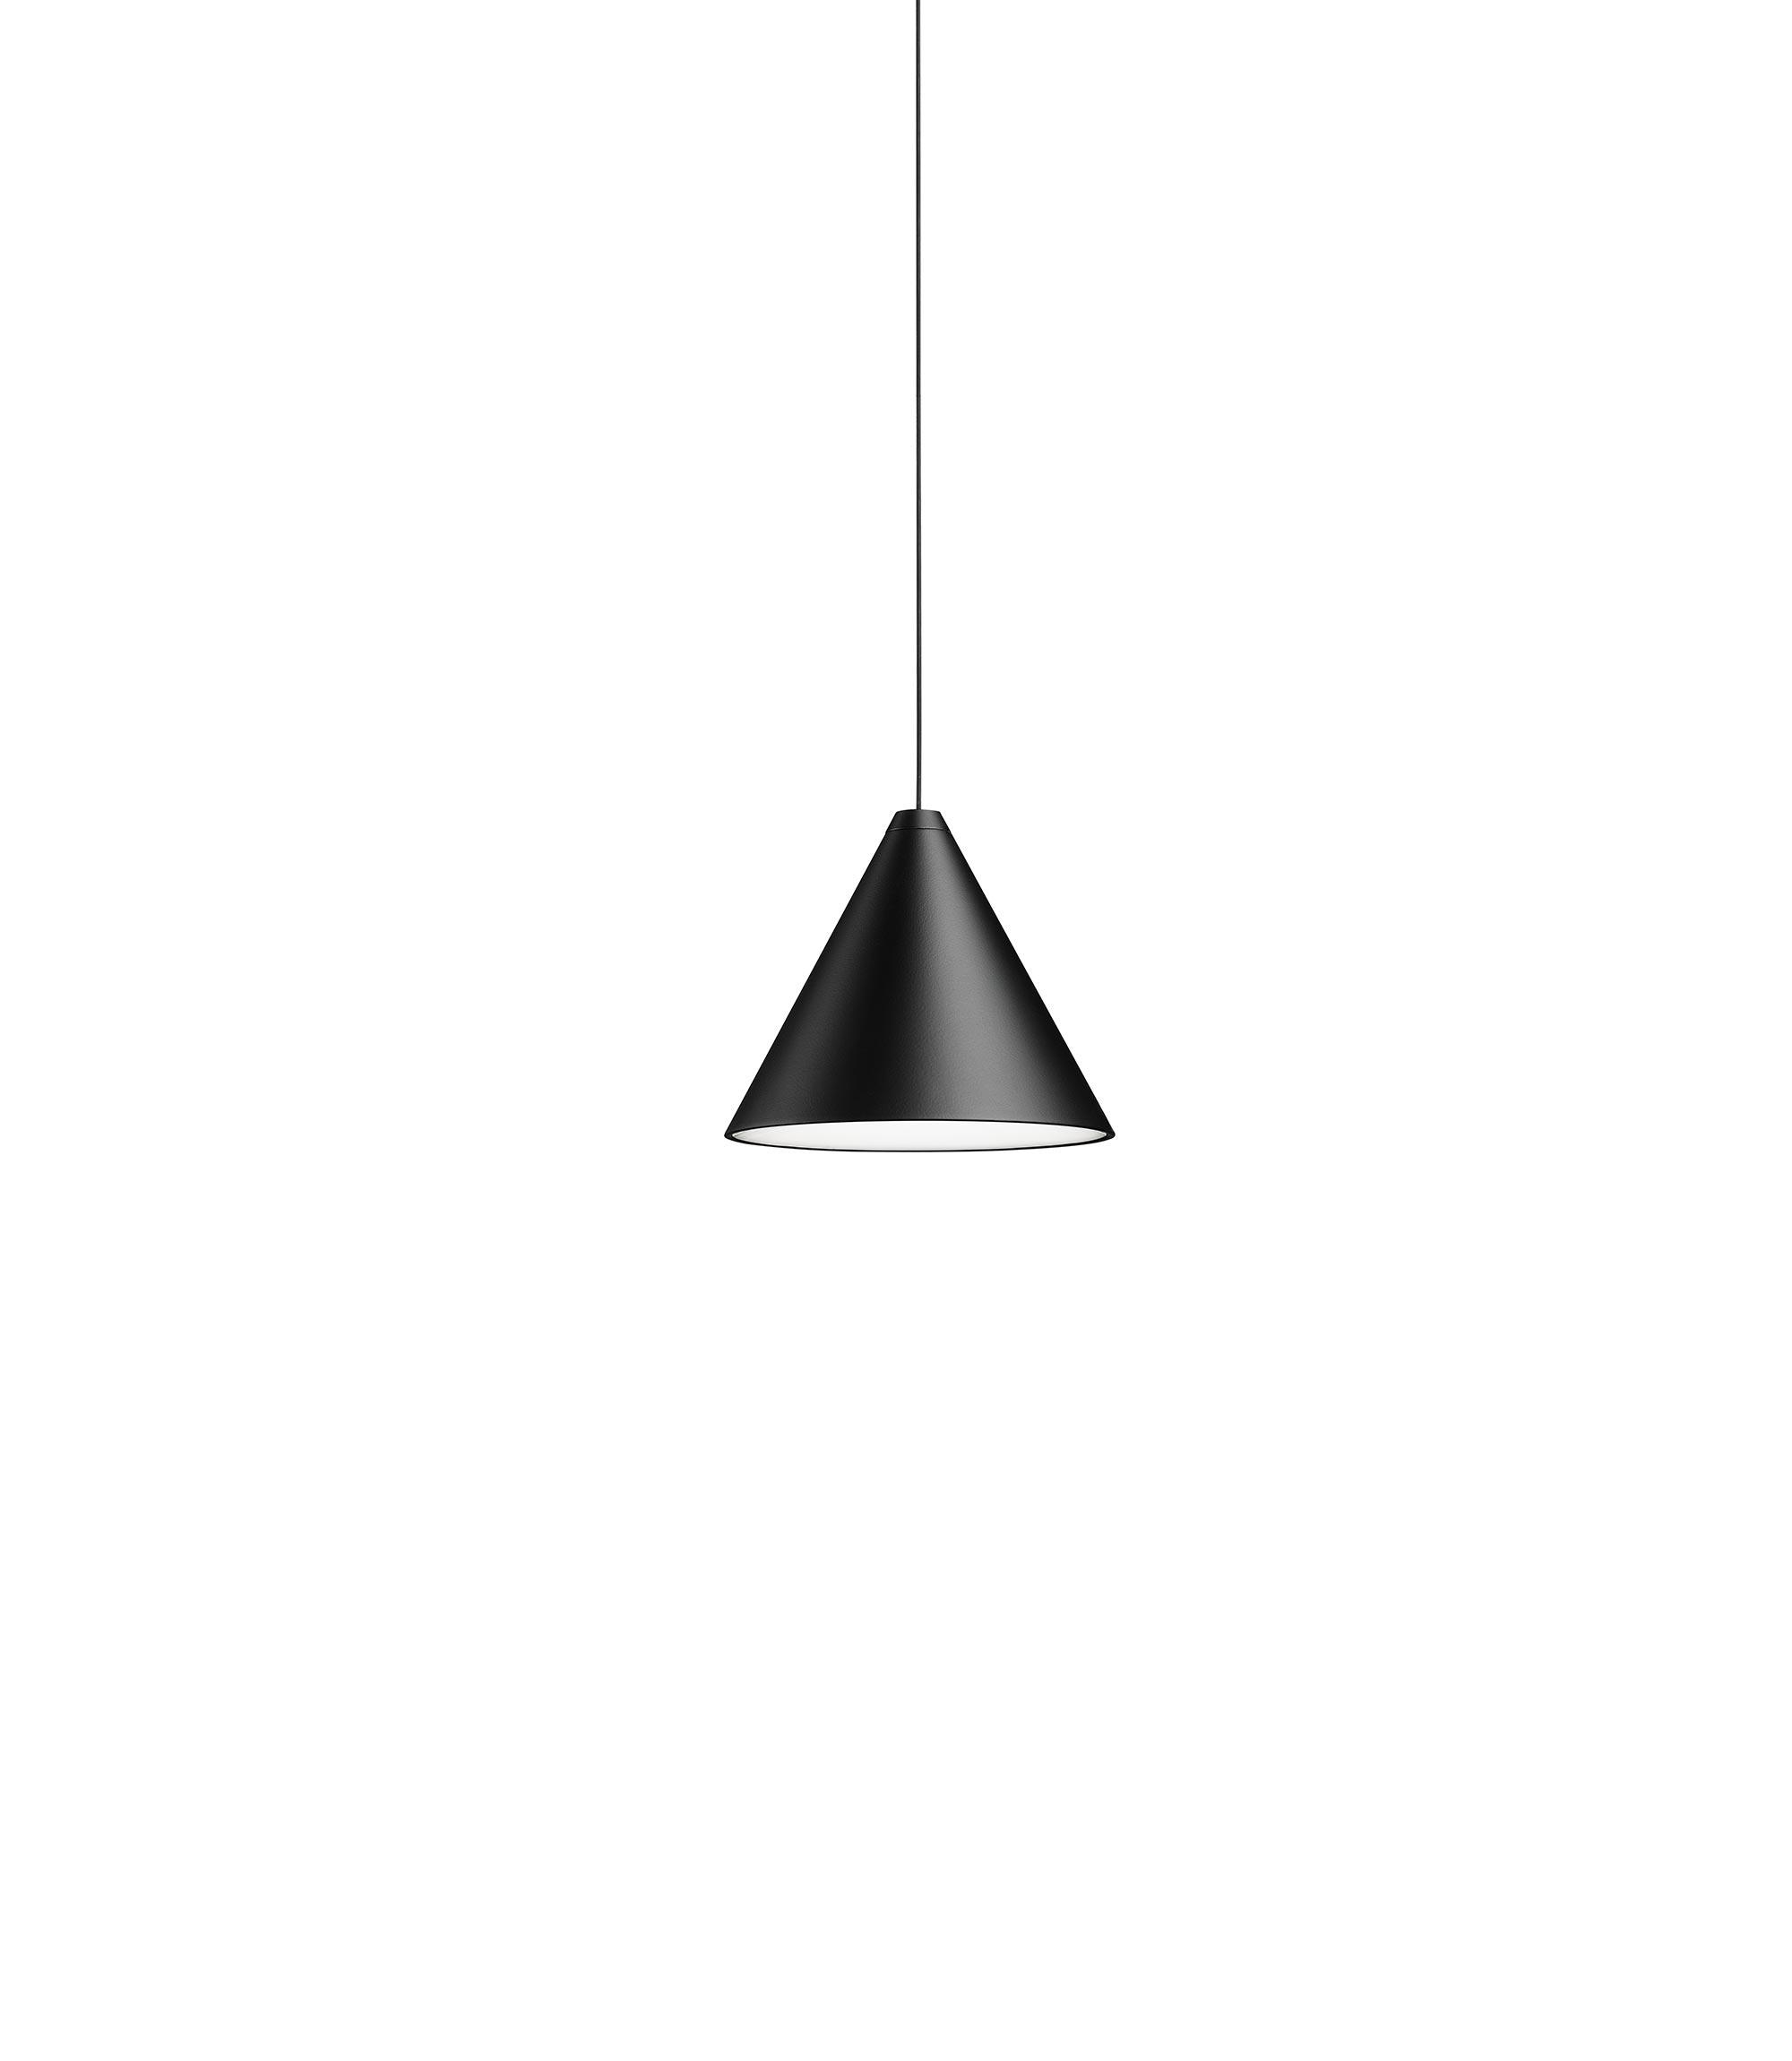 String light suspension cone anastassiades flos F6481030 product still life big